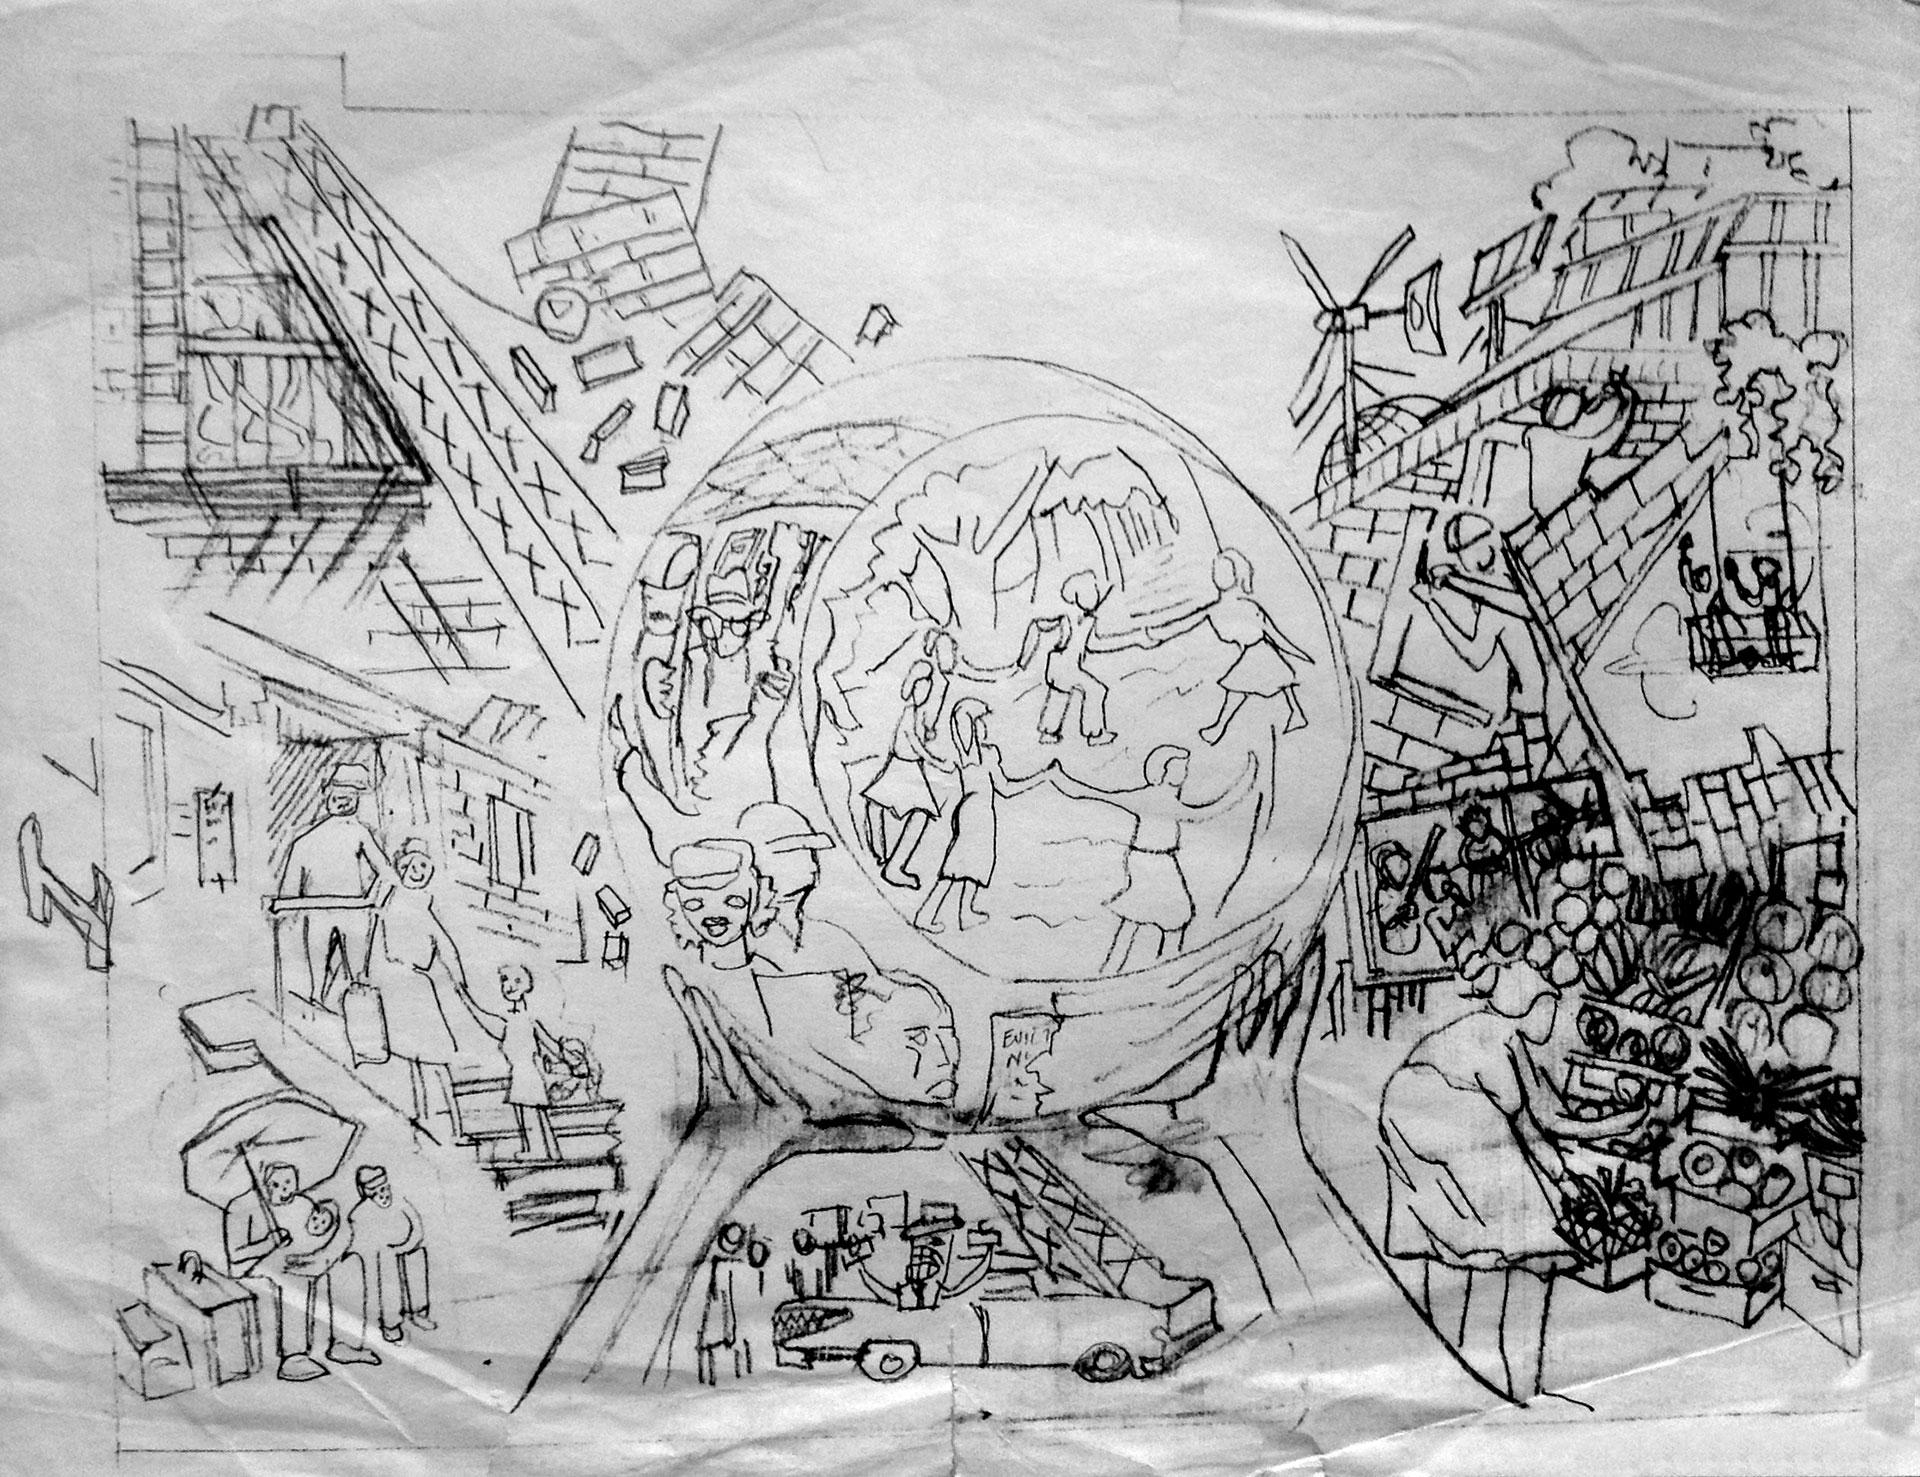 Eva Cockcroft's sketch for the collective mural   Courtesy of Rikki Asher